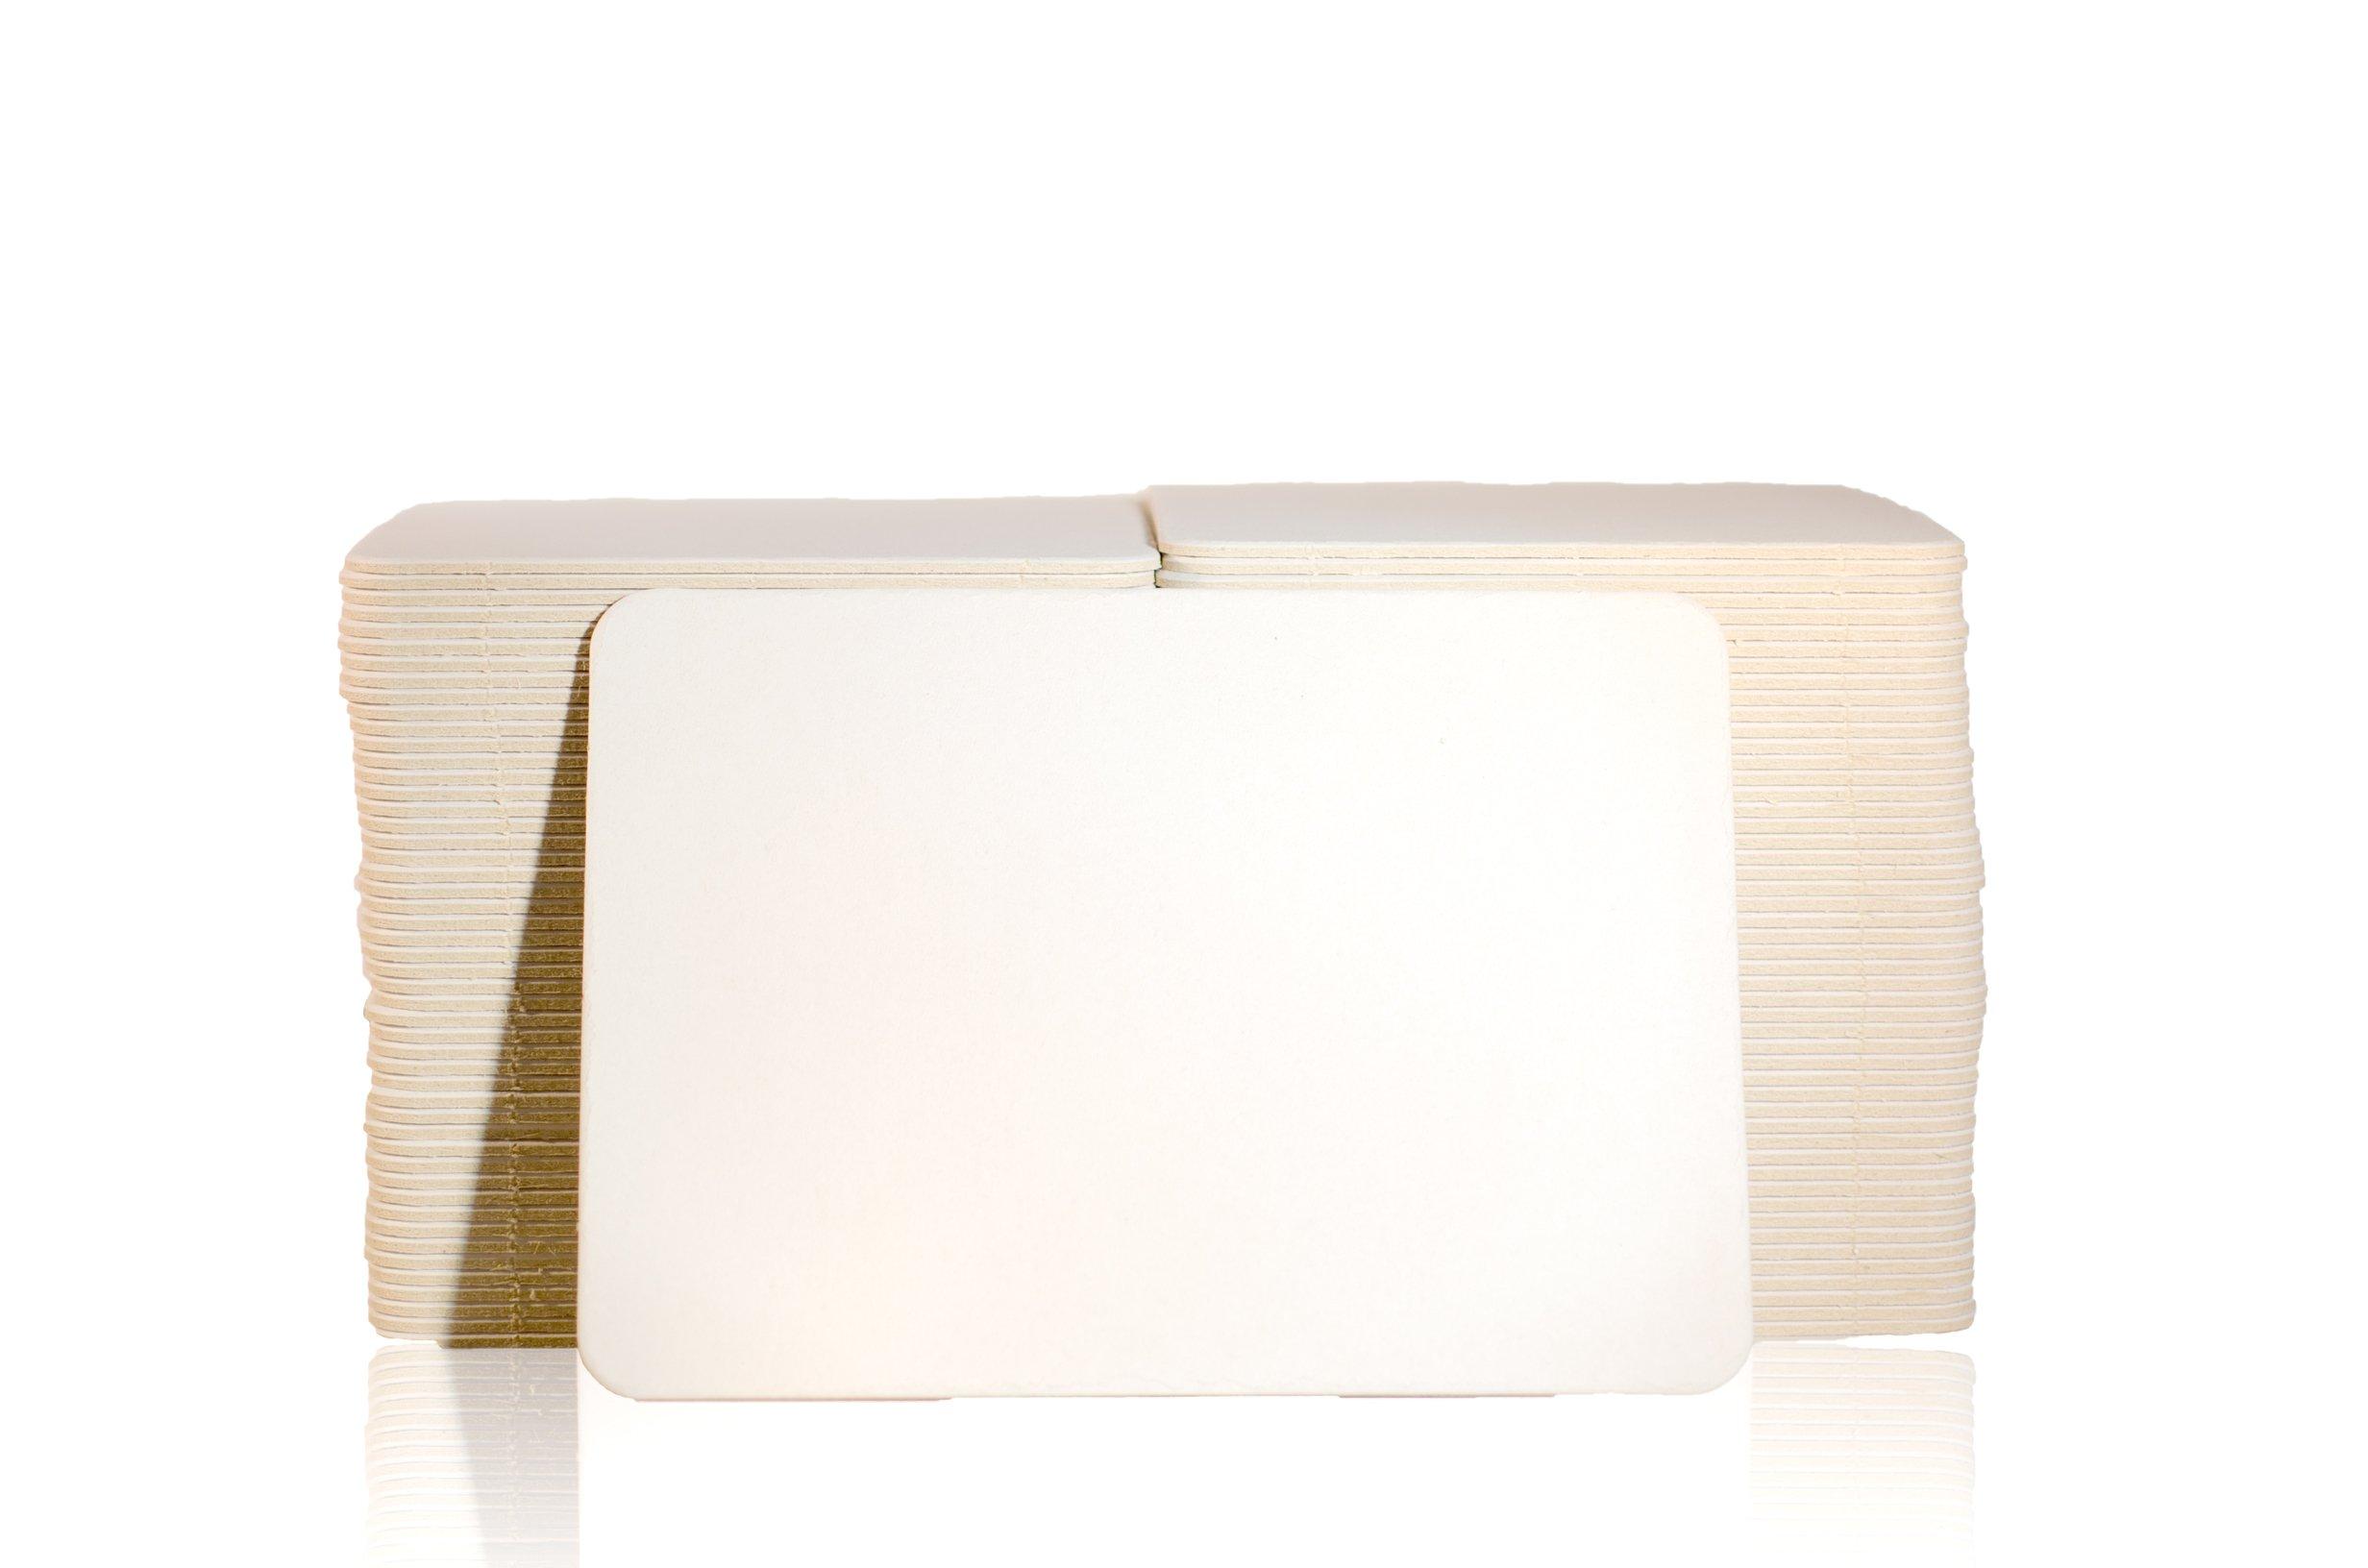 Katz Americas 3 7/8'' x 5 3/8'' Rectangle Heavyweight (80pt) Blank Pulpboard Coaster (Case of 1,000)